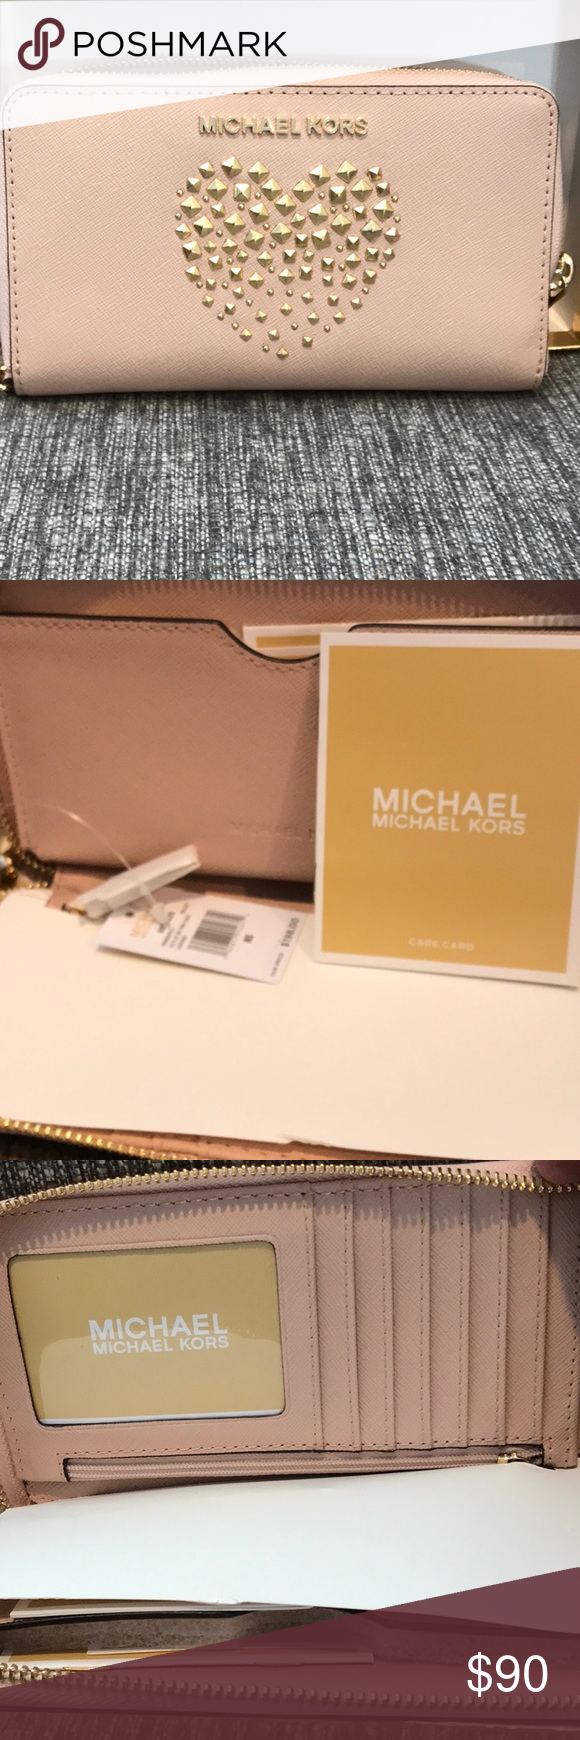 44139ca9af454d NWT MICHAEL KORS WRISTLET WALLET CLUTCH NEW MICHAEL KORS GIFTABLE LARGE  FLAT MULTIFUNCTION PHONE WRISTLET WALLET